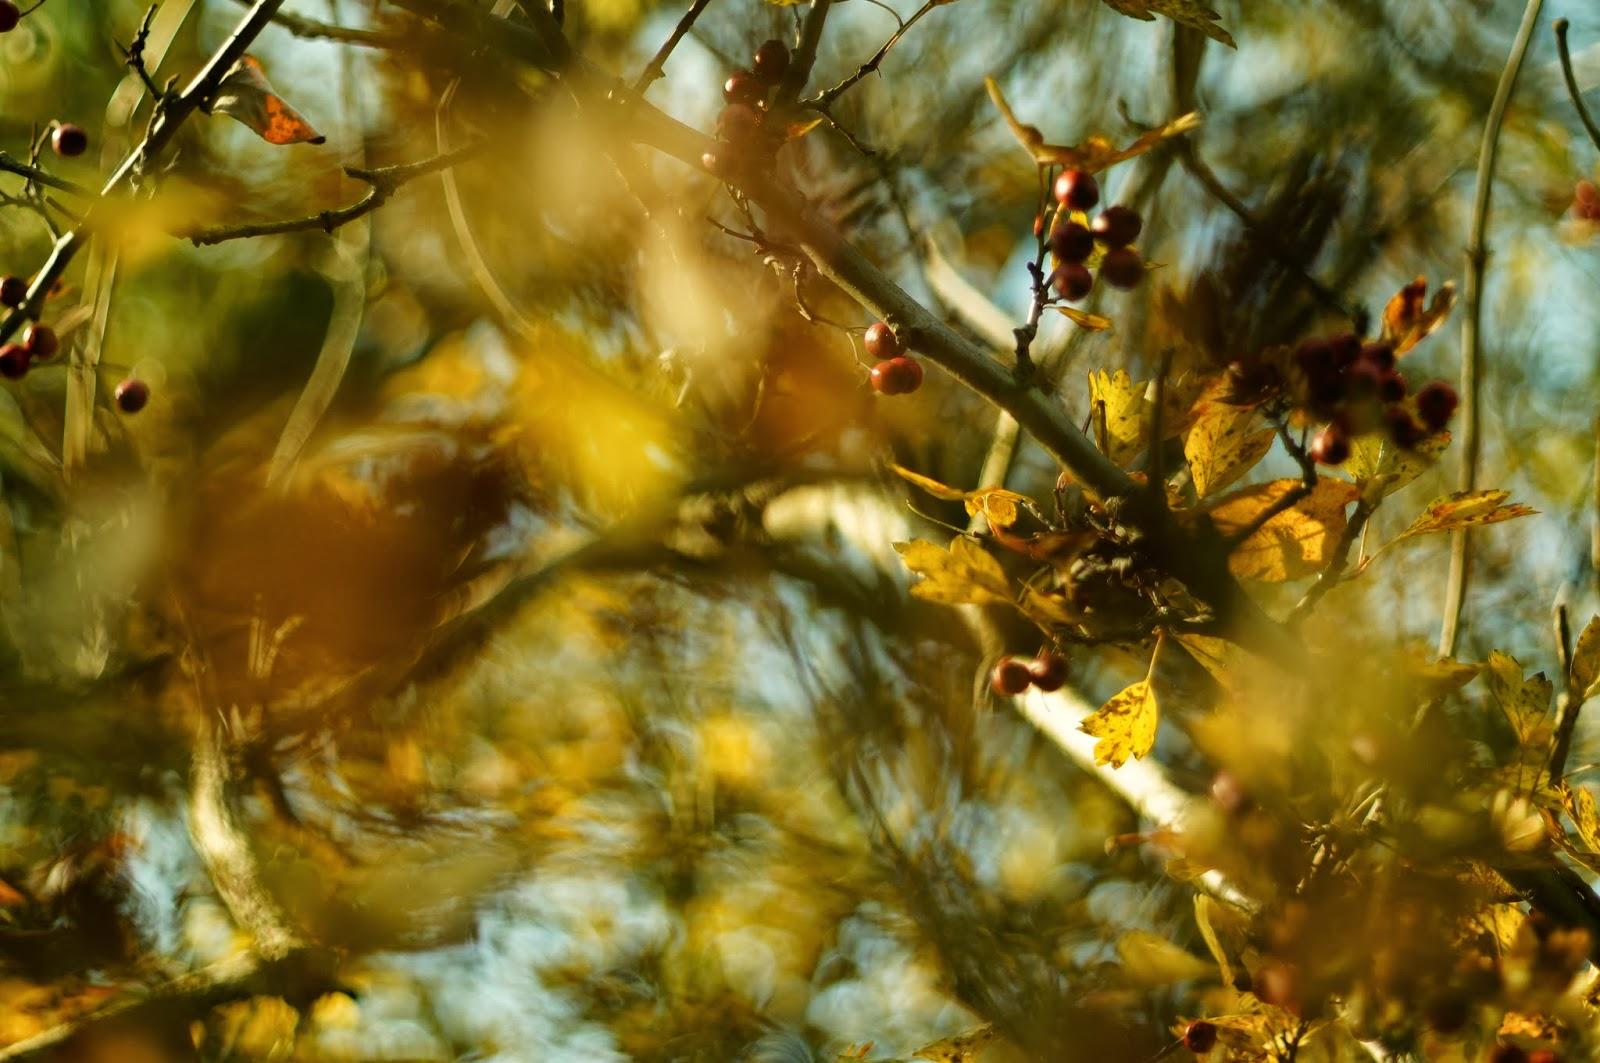 Carl Zeiss Jena Pancolar 50mm f/1.8 Zebra M42 sample